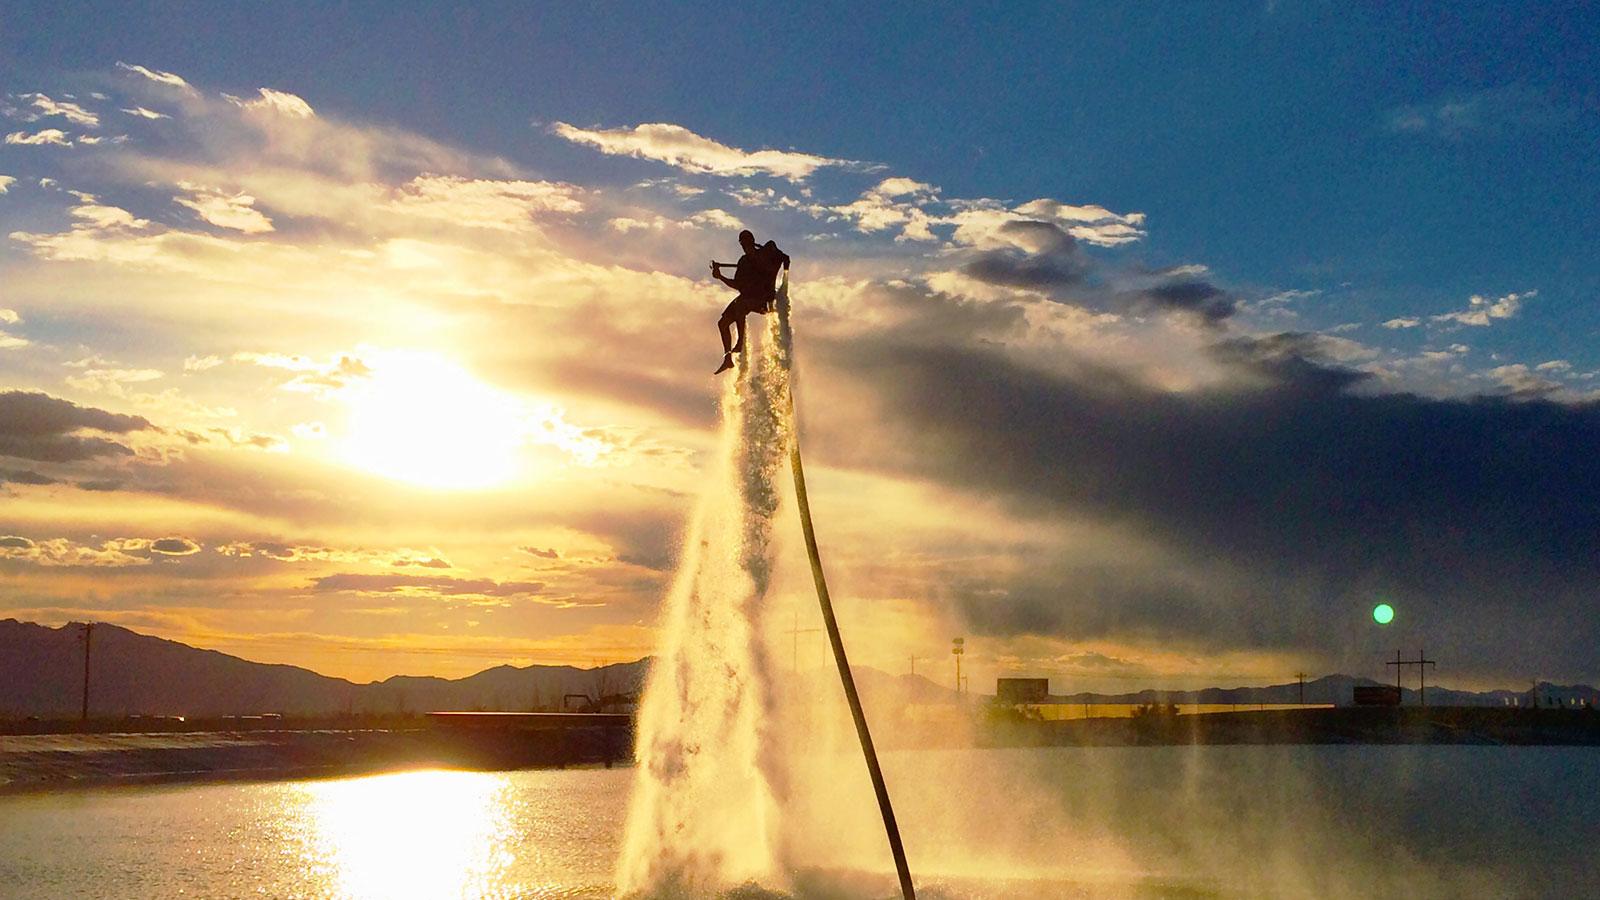 Jetpack America - Las Vegas Attractions